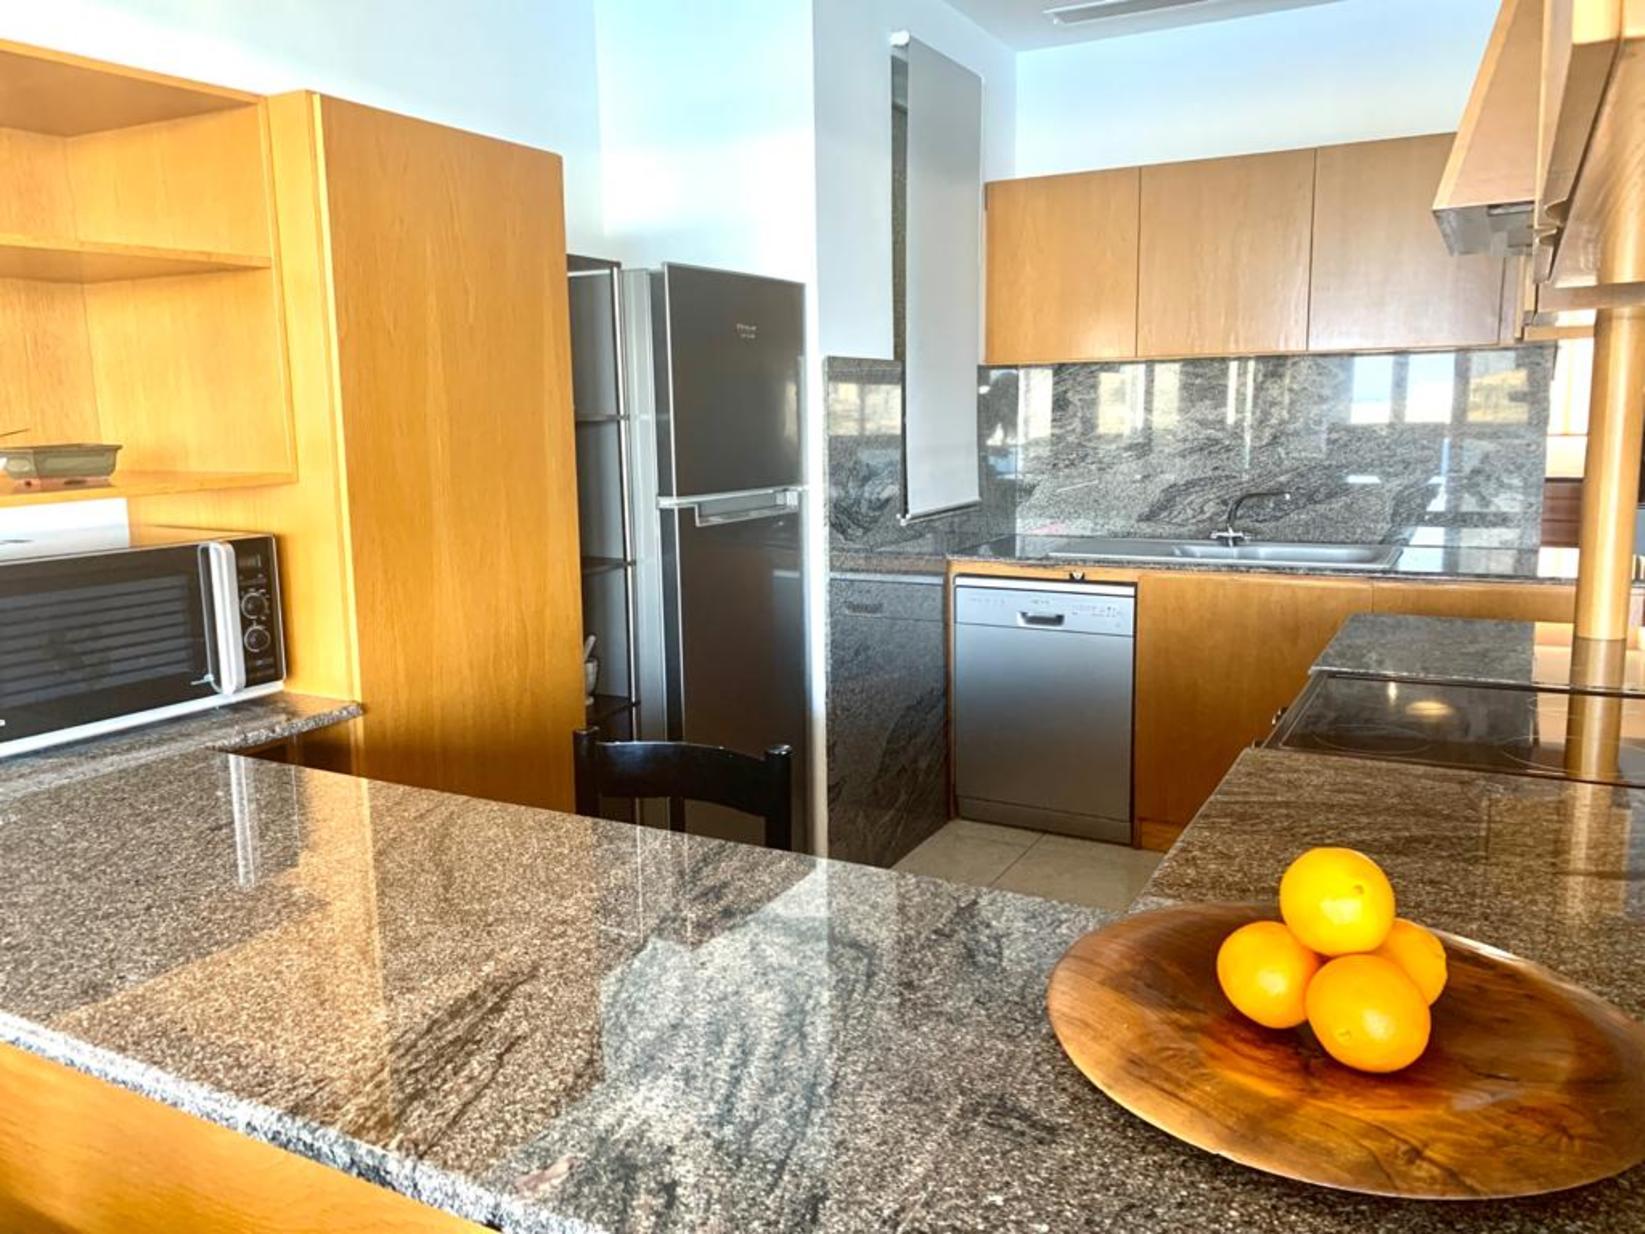 2 bed Apartment For Rent in Sliema, Sliema - thumb 11